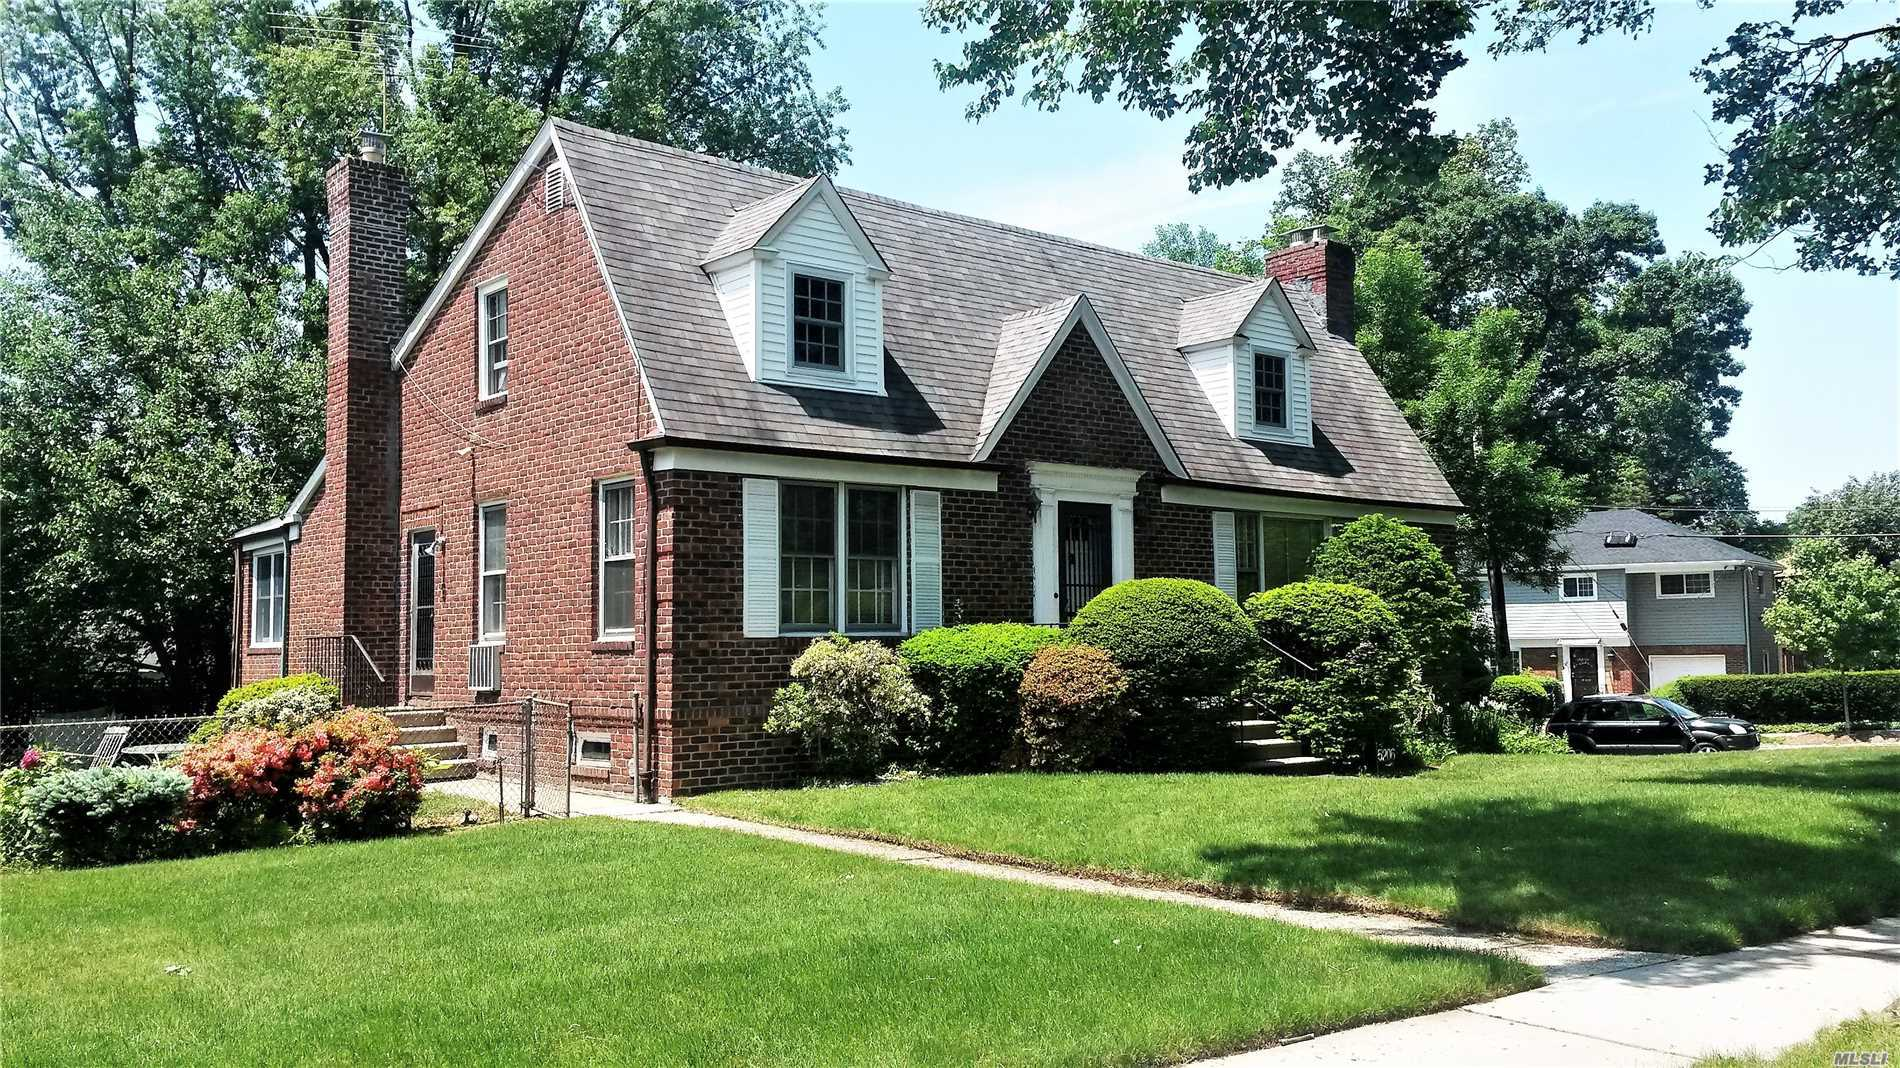 Large 112 X 105 Corner Property On A Beautiful Tree Line Street